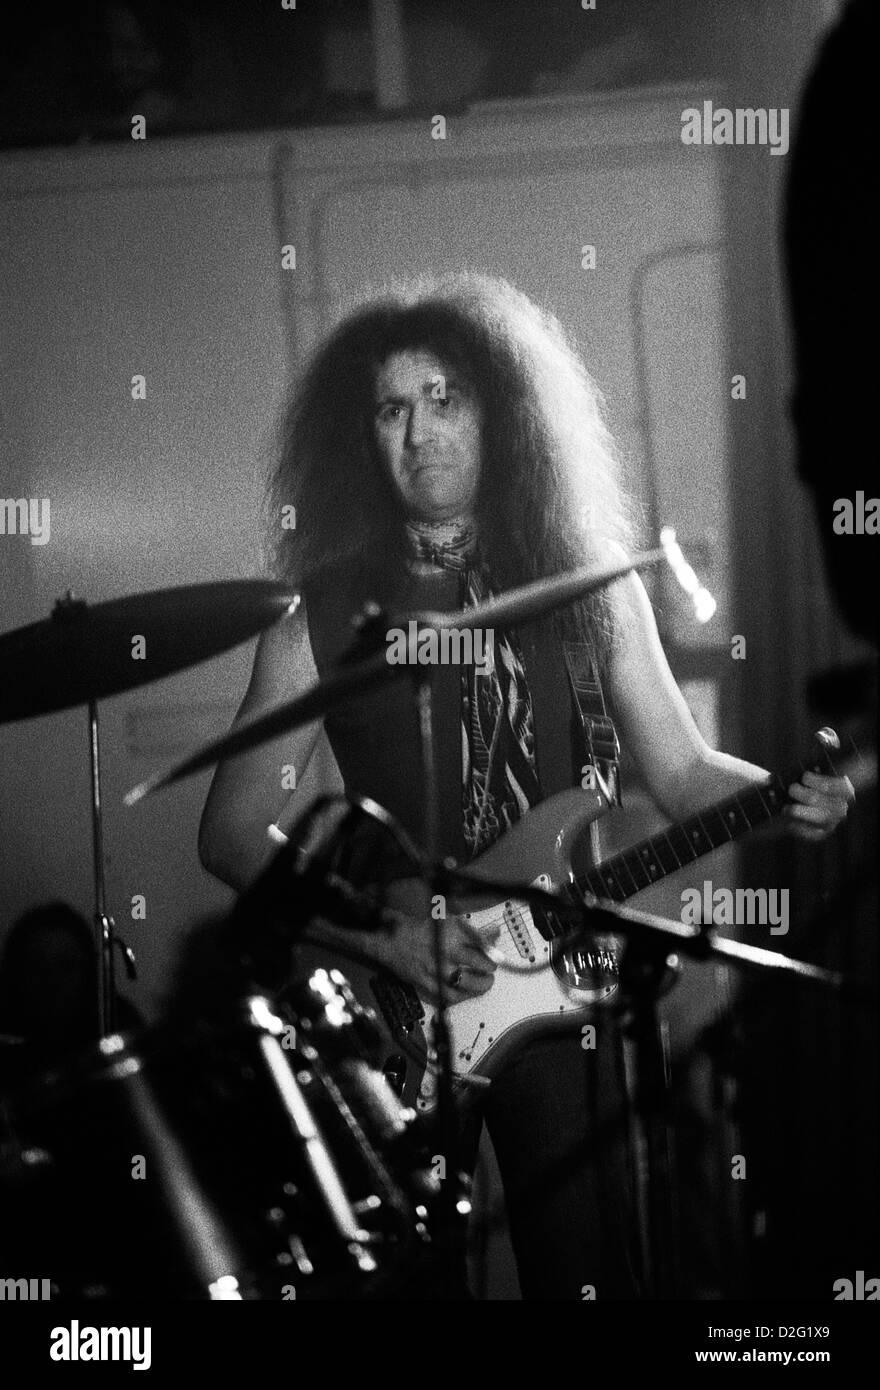 Pink Fairies musician Larry Wallis playing guitar at a gig London England UK 1975  KATHY DEWITT - Stock Image